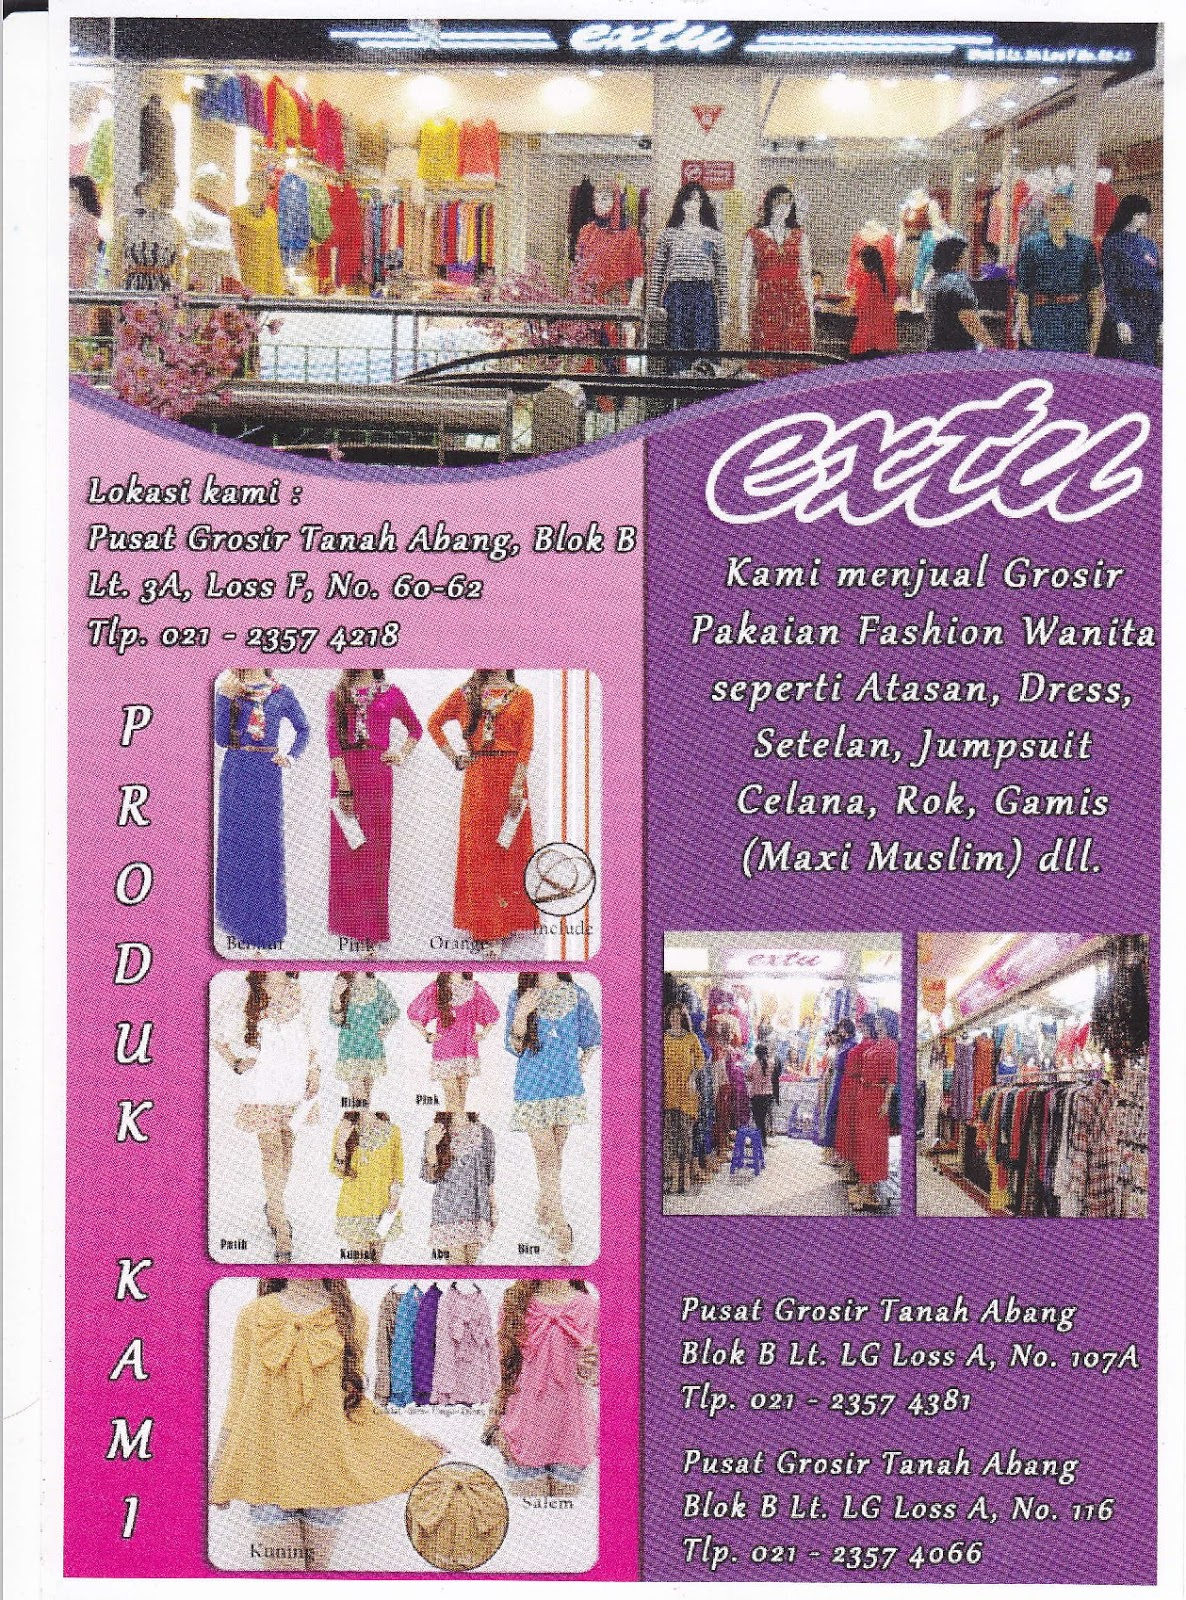 Extu Pakaian Fashion Wanita Jasa Sebar Brosur Obral Tekken Dress Molly Navy 1966a2f892